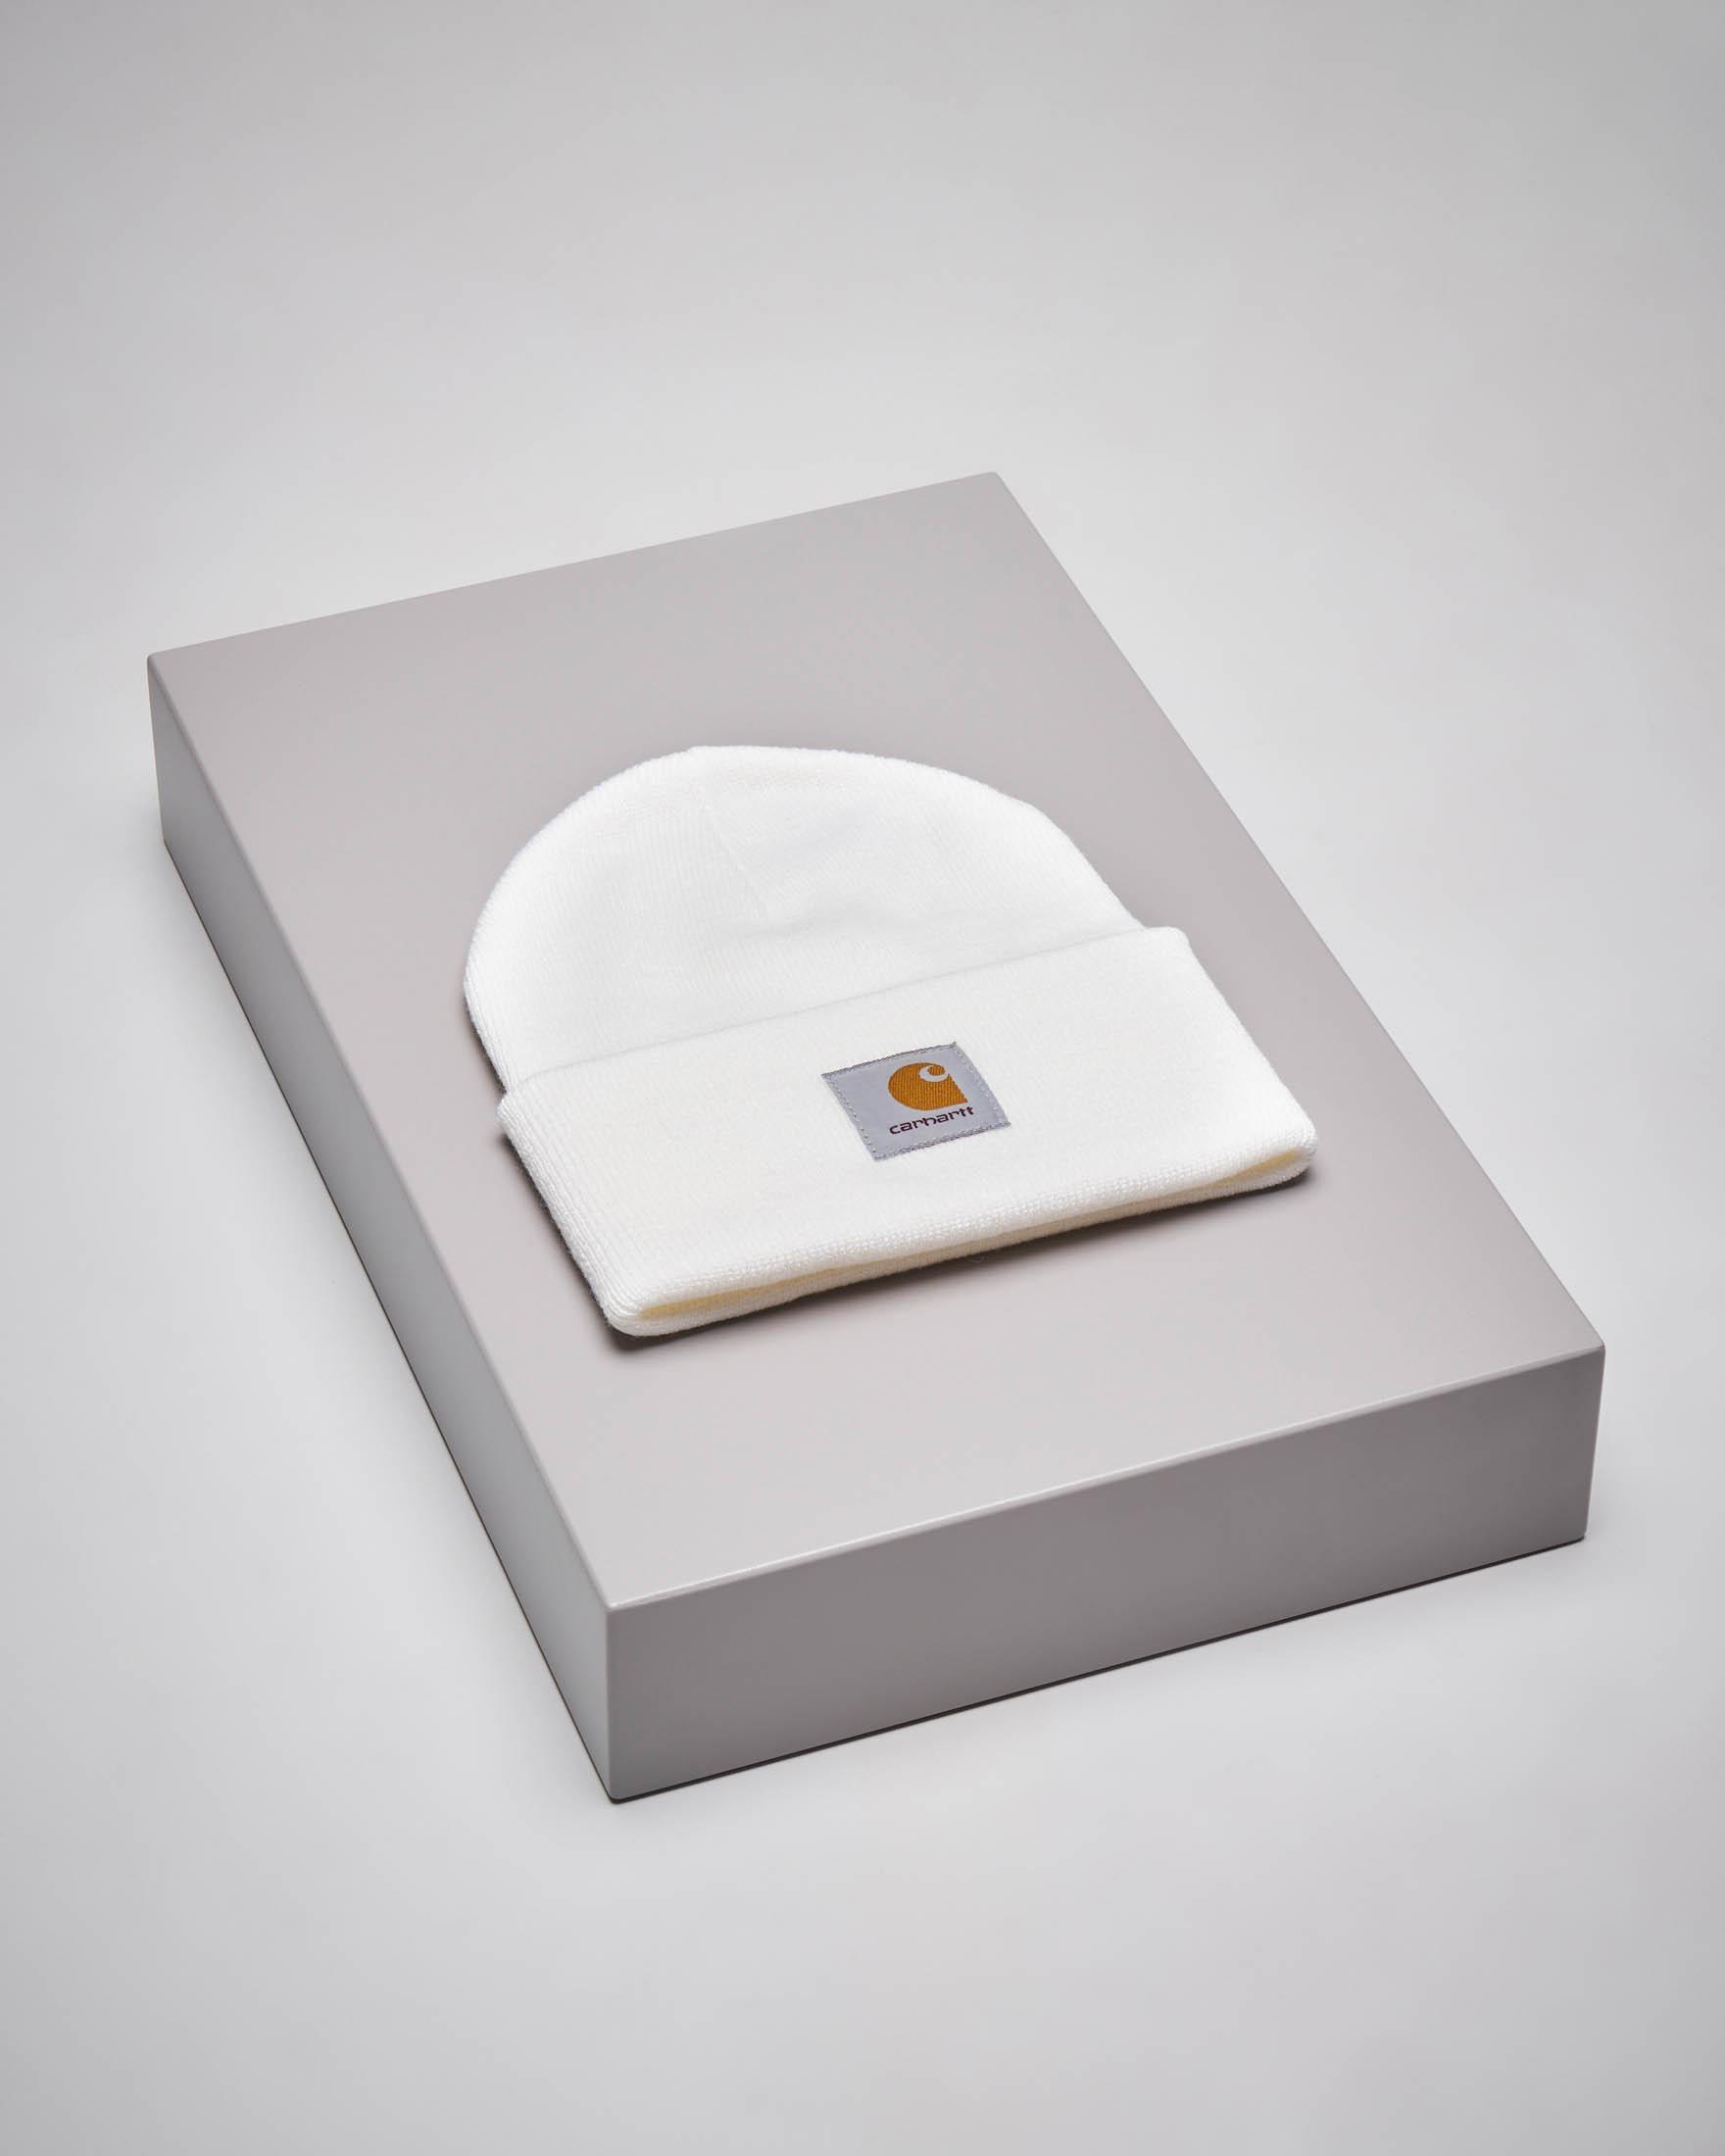 Berretto Acrylic Watch Hat bianco con logo